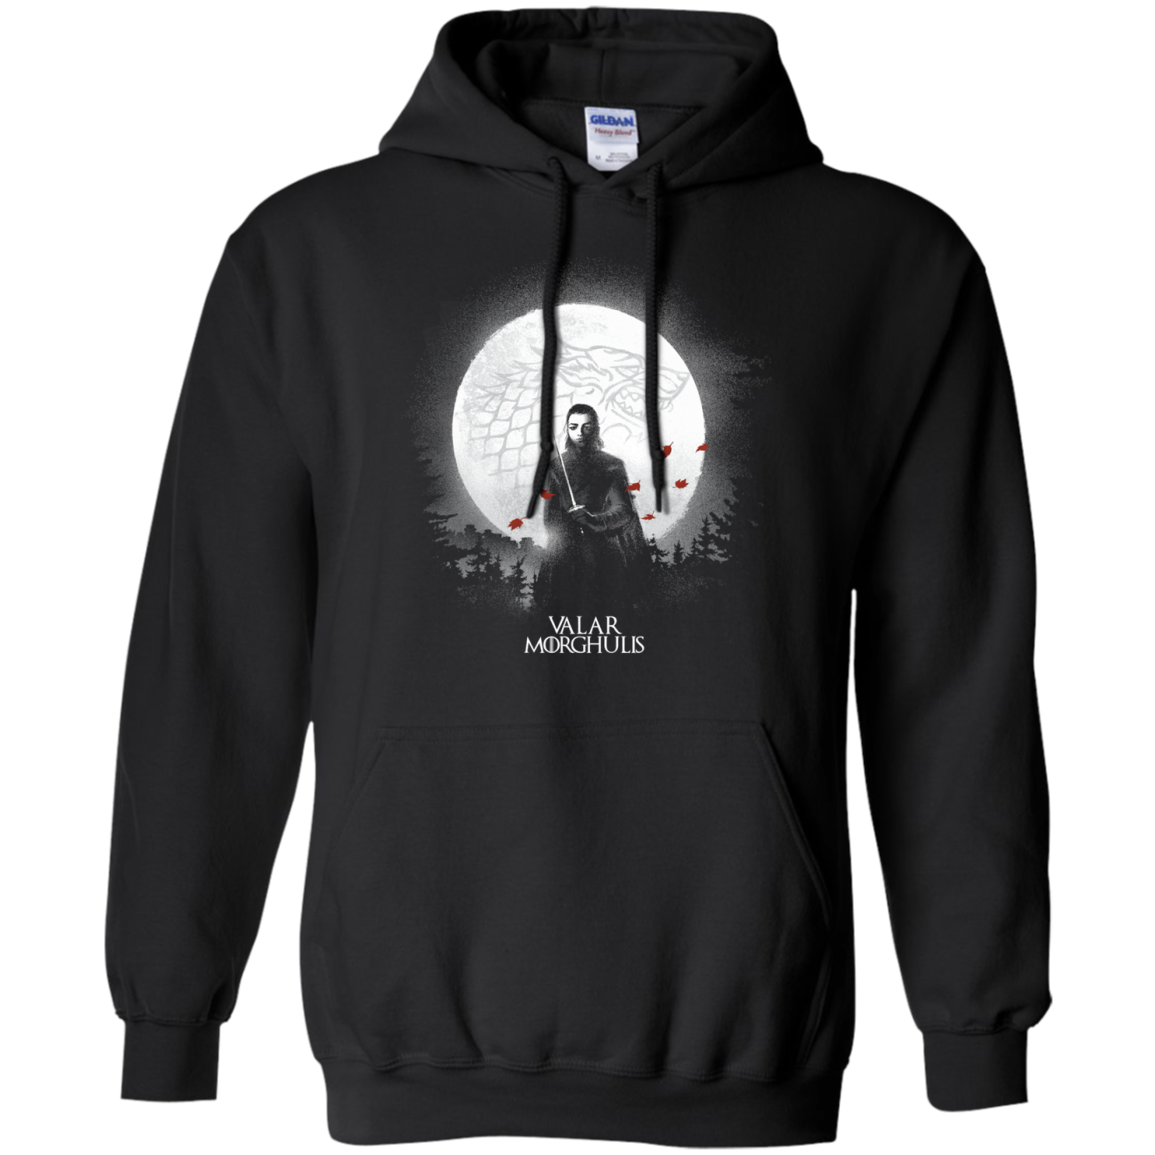 Get Here Valar Morghulis Game Of Thrones Tula Store Shirts